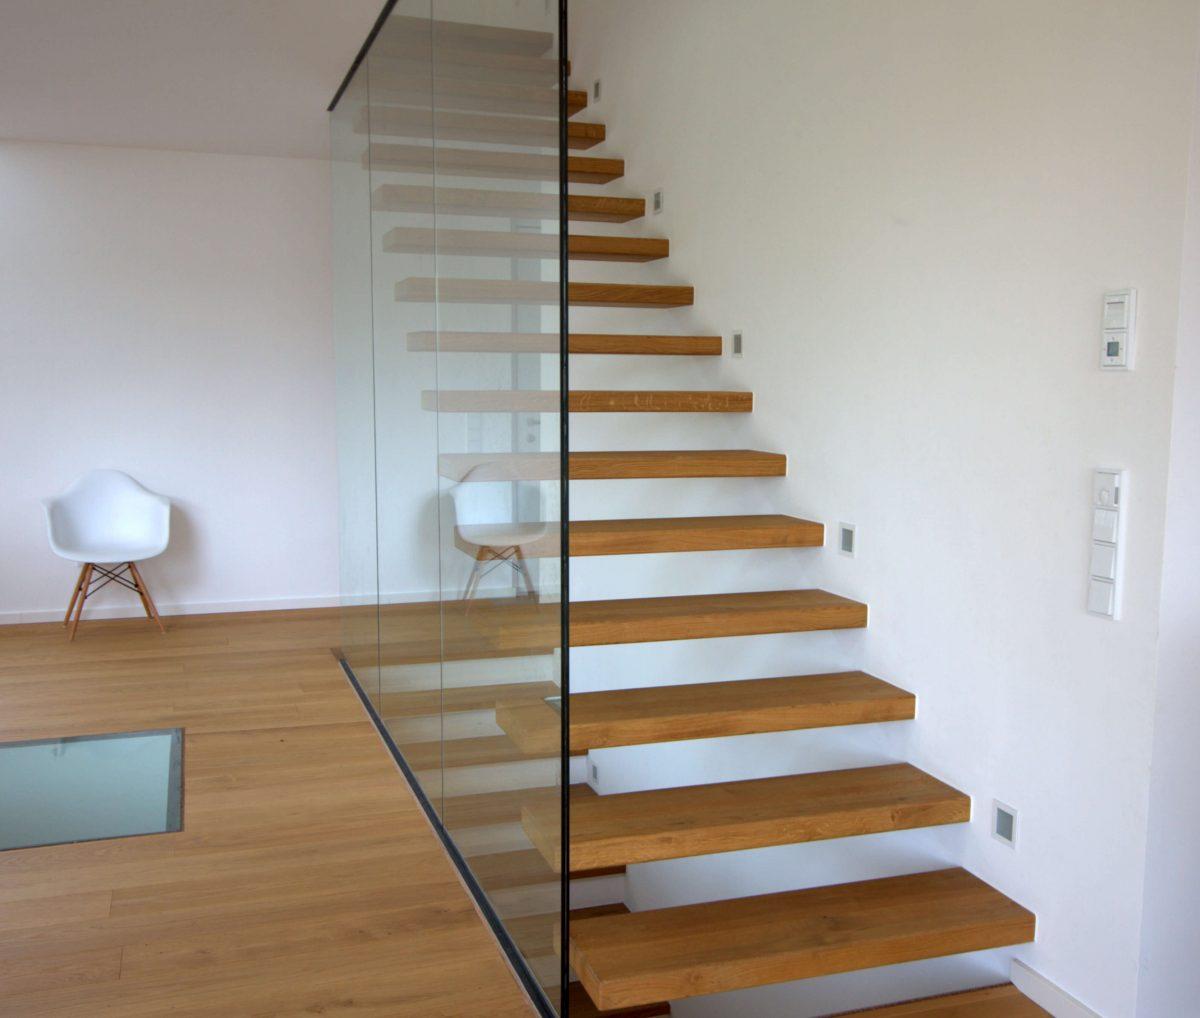 treppe von gerber ingenieure auf instagram gerber ingenieure gmbh. Black Bedroom Furniture Sets. Home Design Ideas